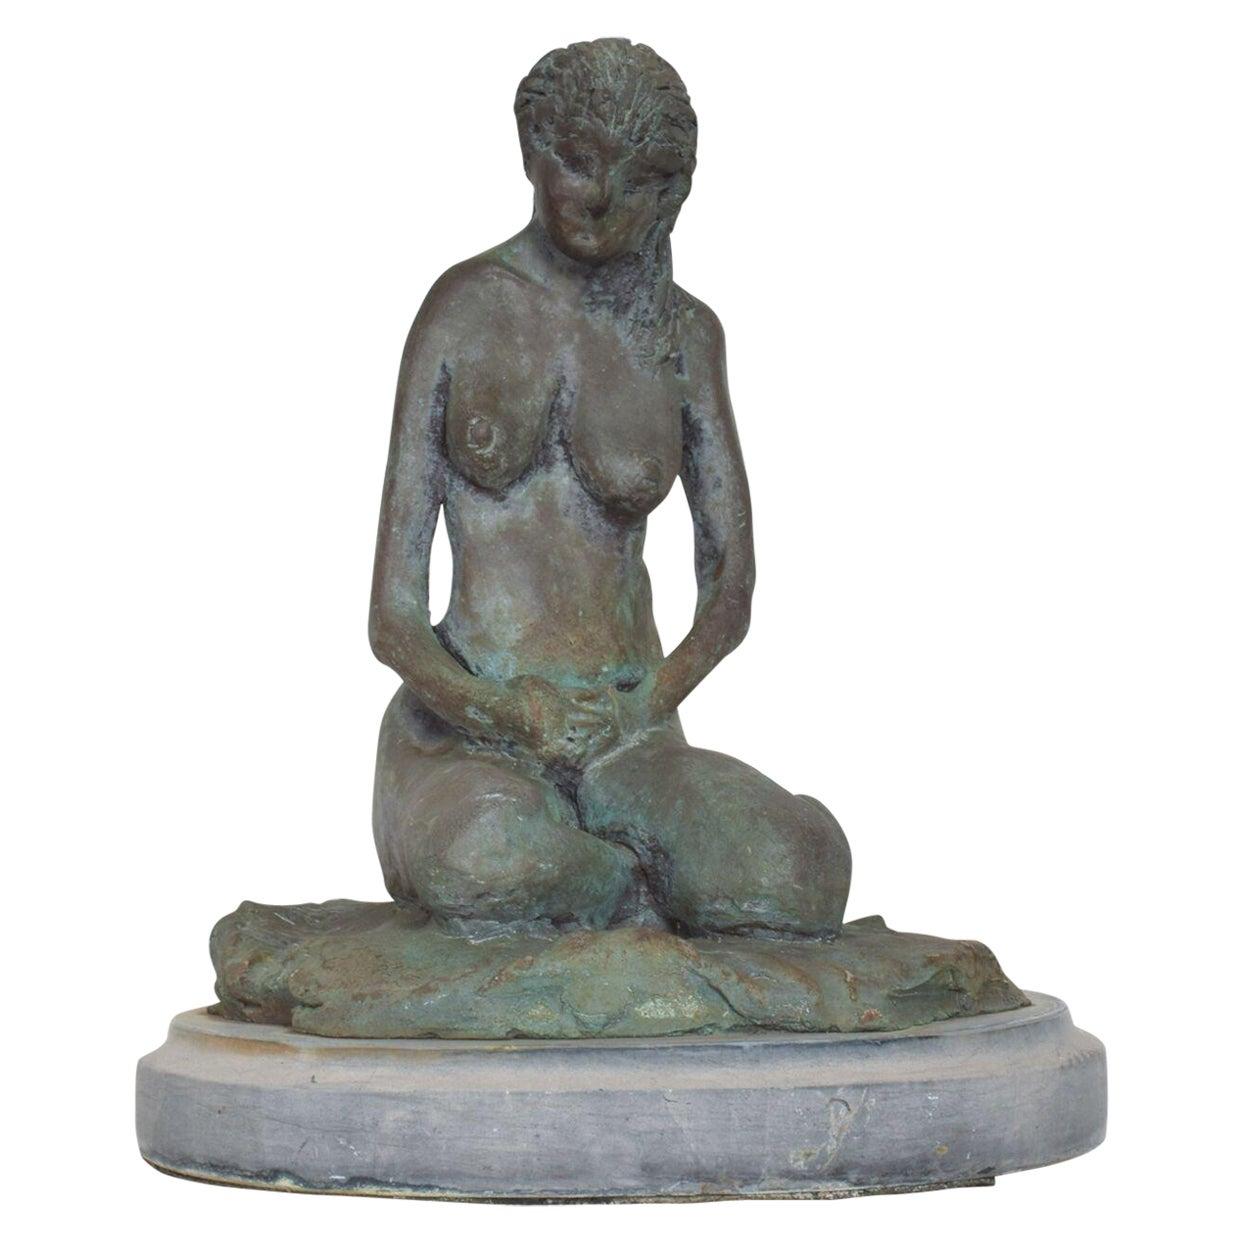 Modern Cast Bronze Sculpture Nude Female Reflective Posture Francisco Zuniga